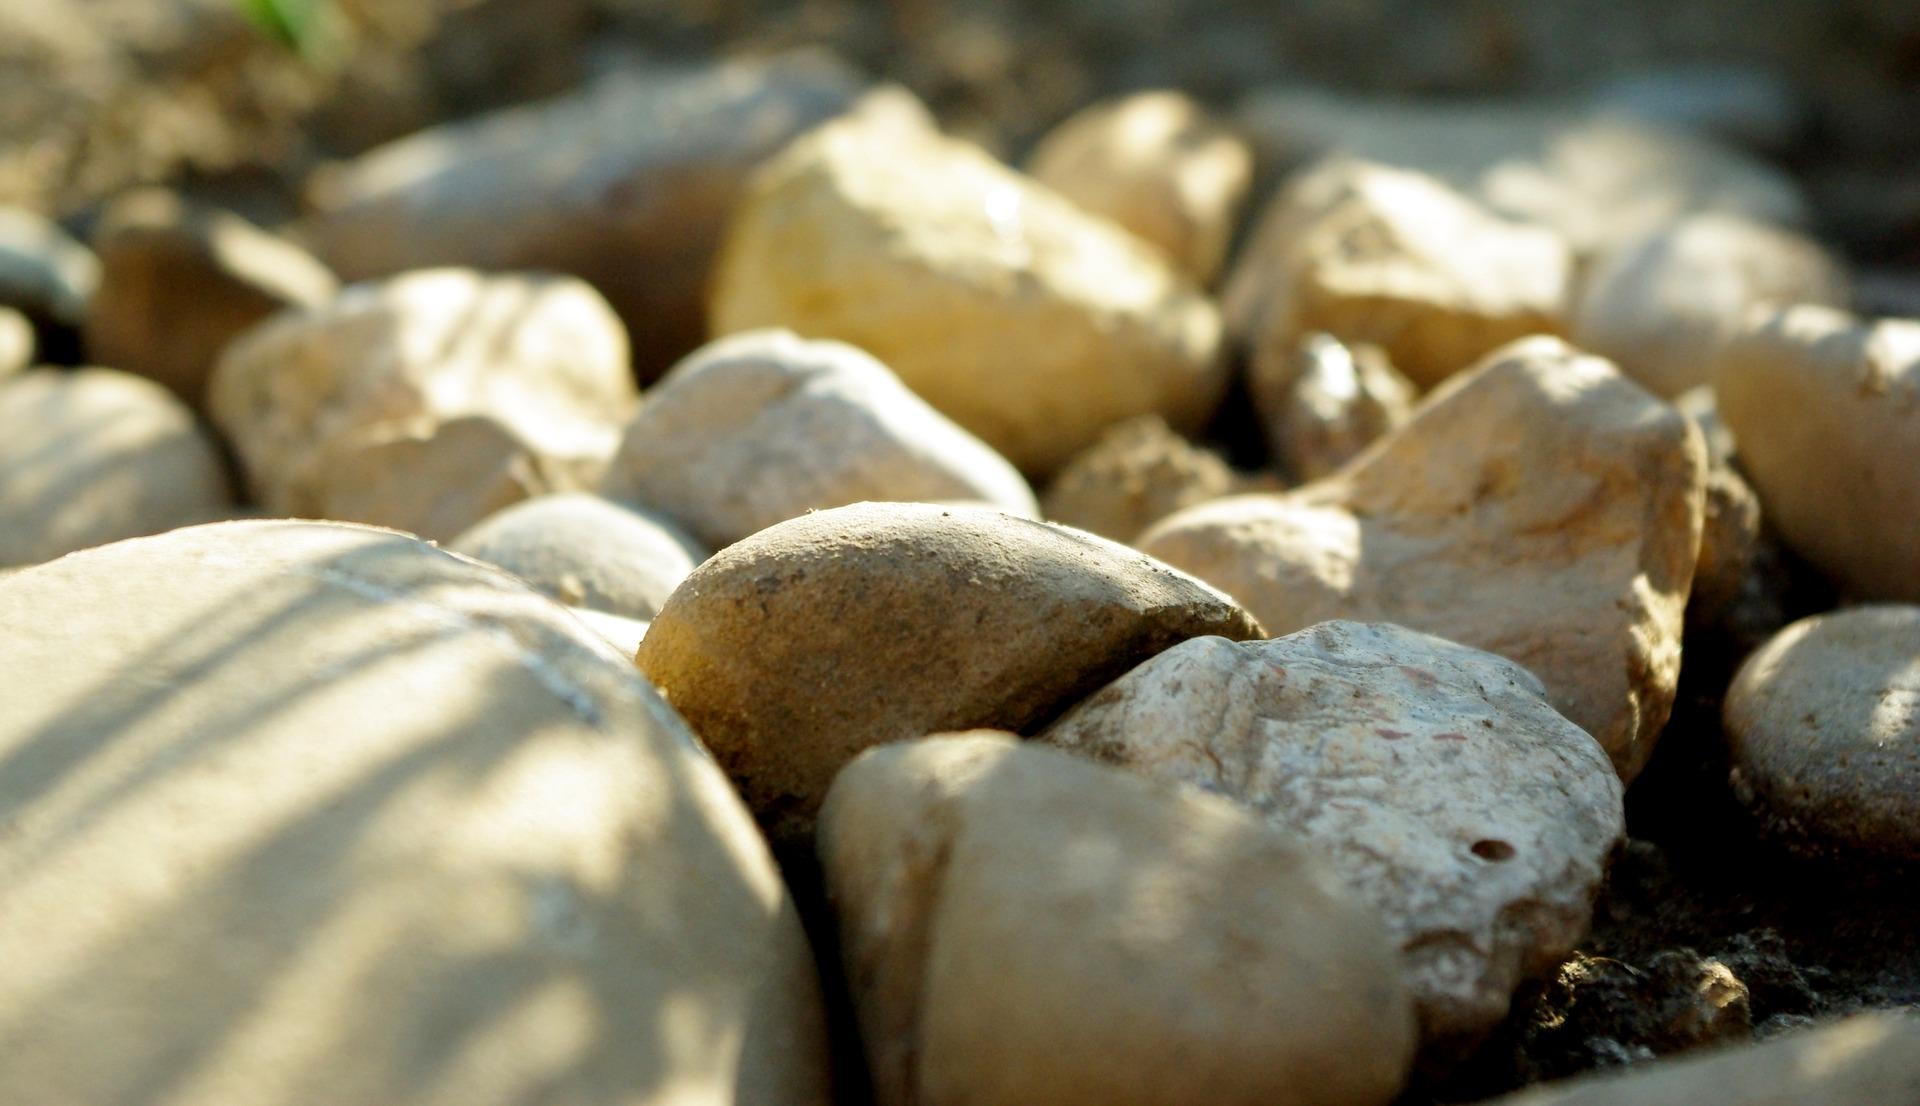 stones nature light rocks.jpg